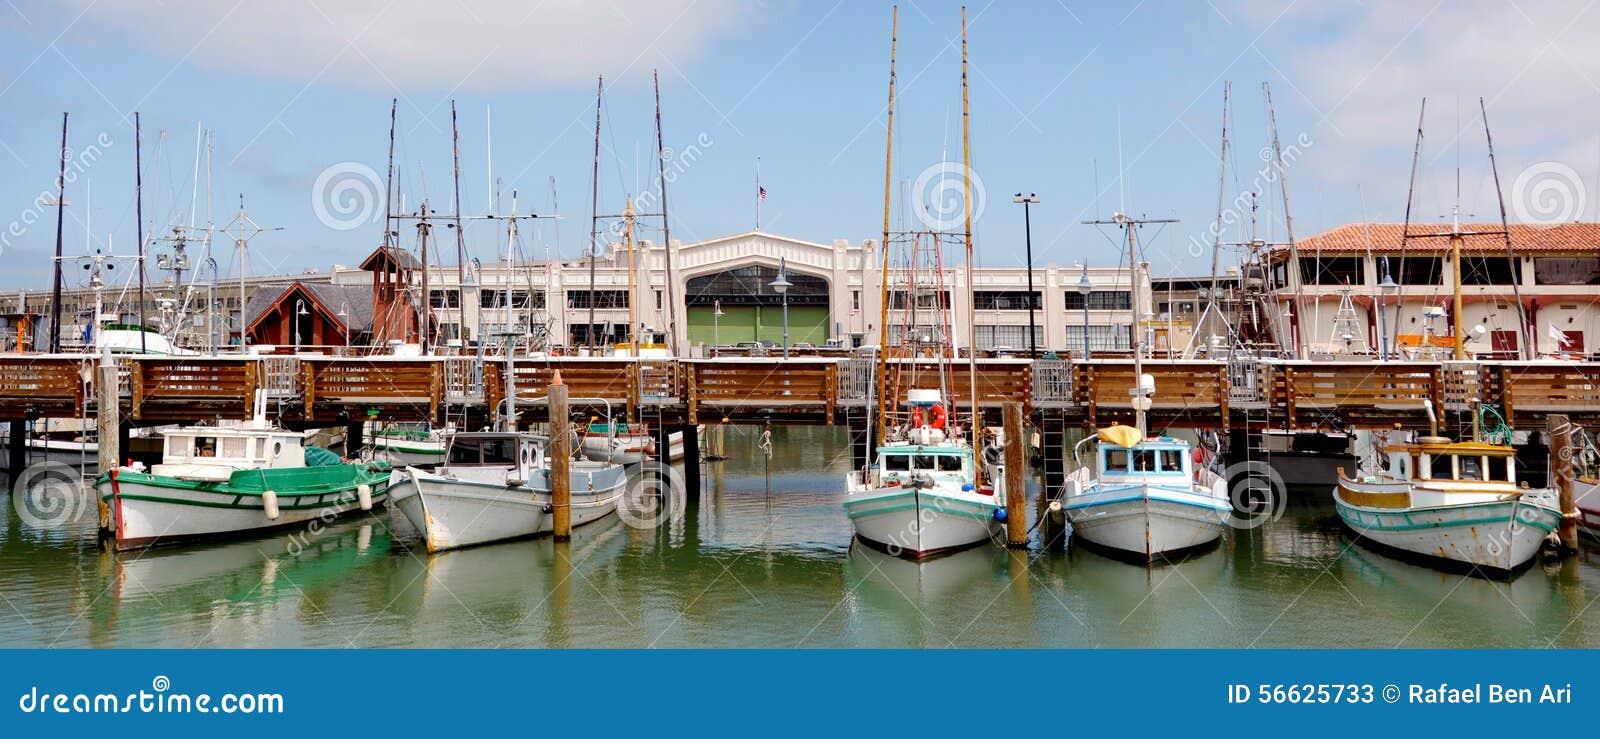 Best Food Fisherman S Wharf